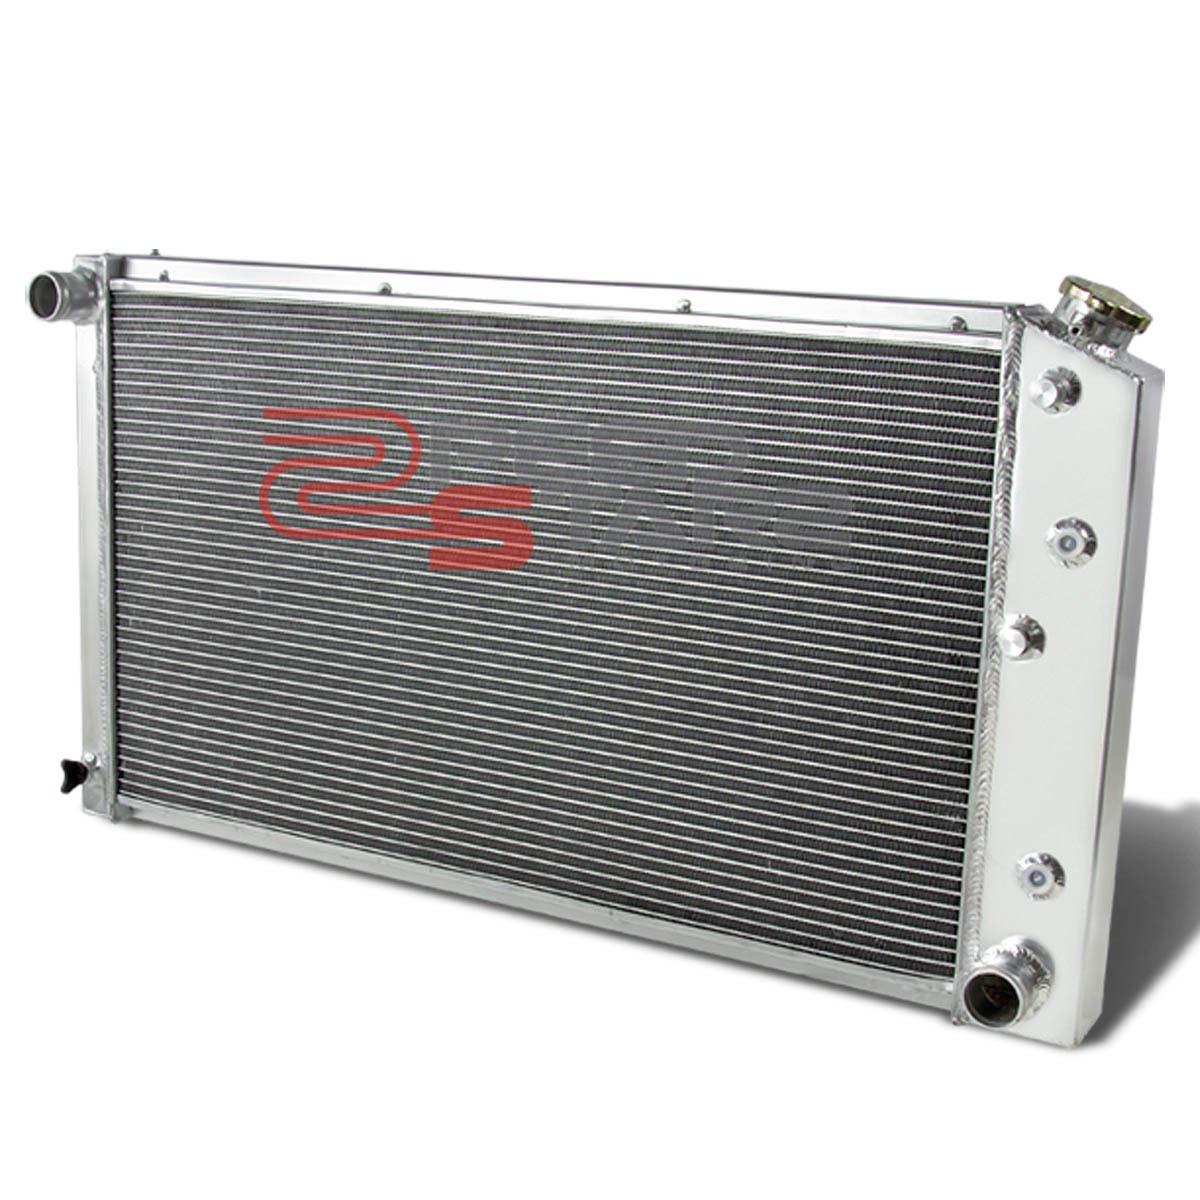 Aluminum Dual Core Two Row Racing Radiator For GMC C2500 Base//Sierra Chevy C20